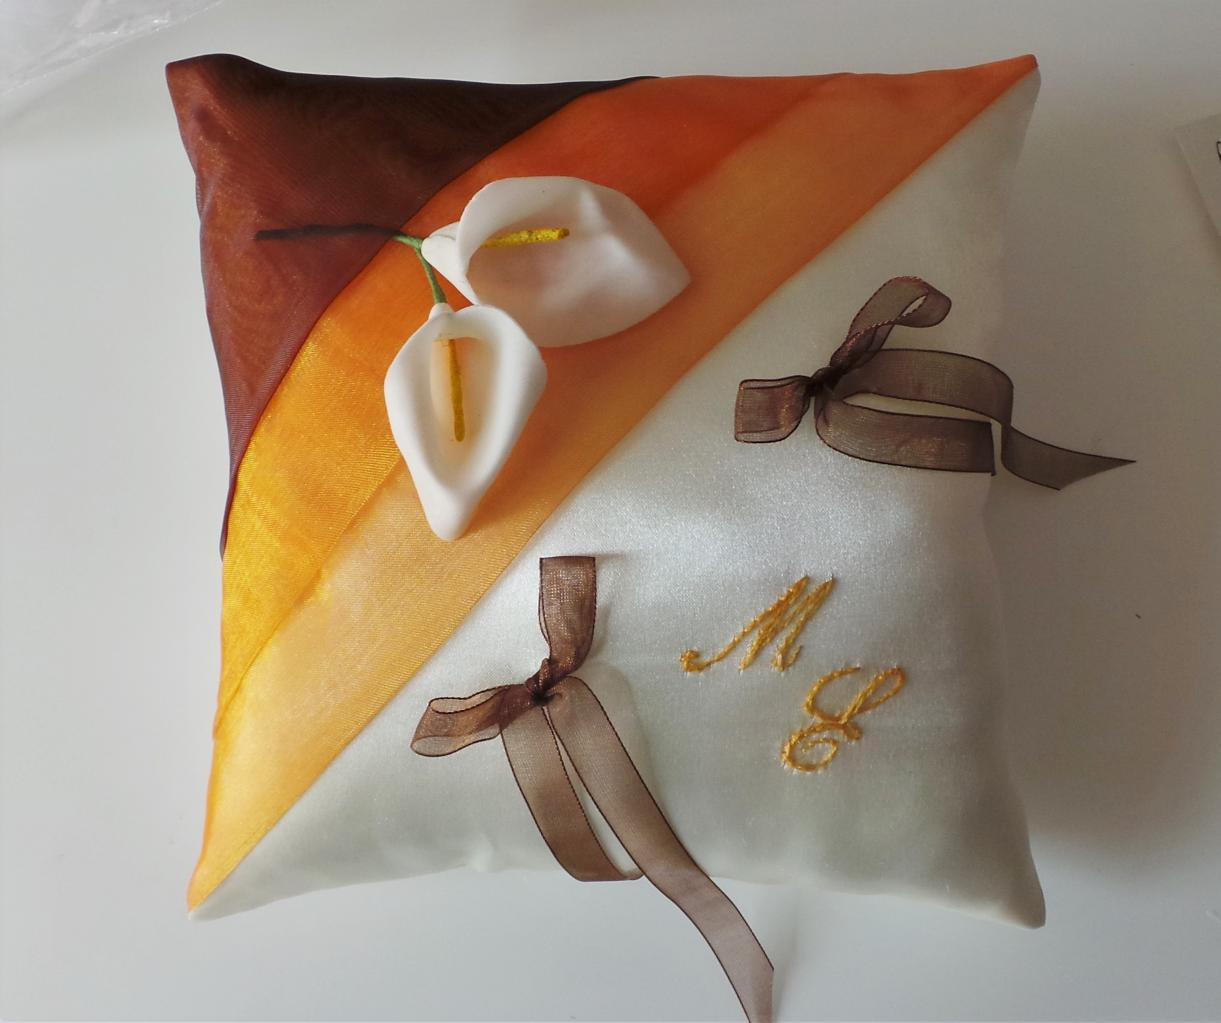 coussin alliances orange marron (1)